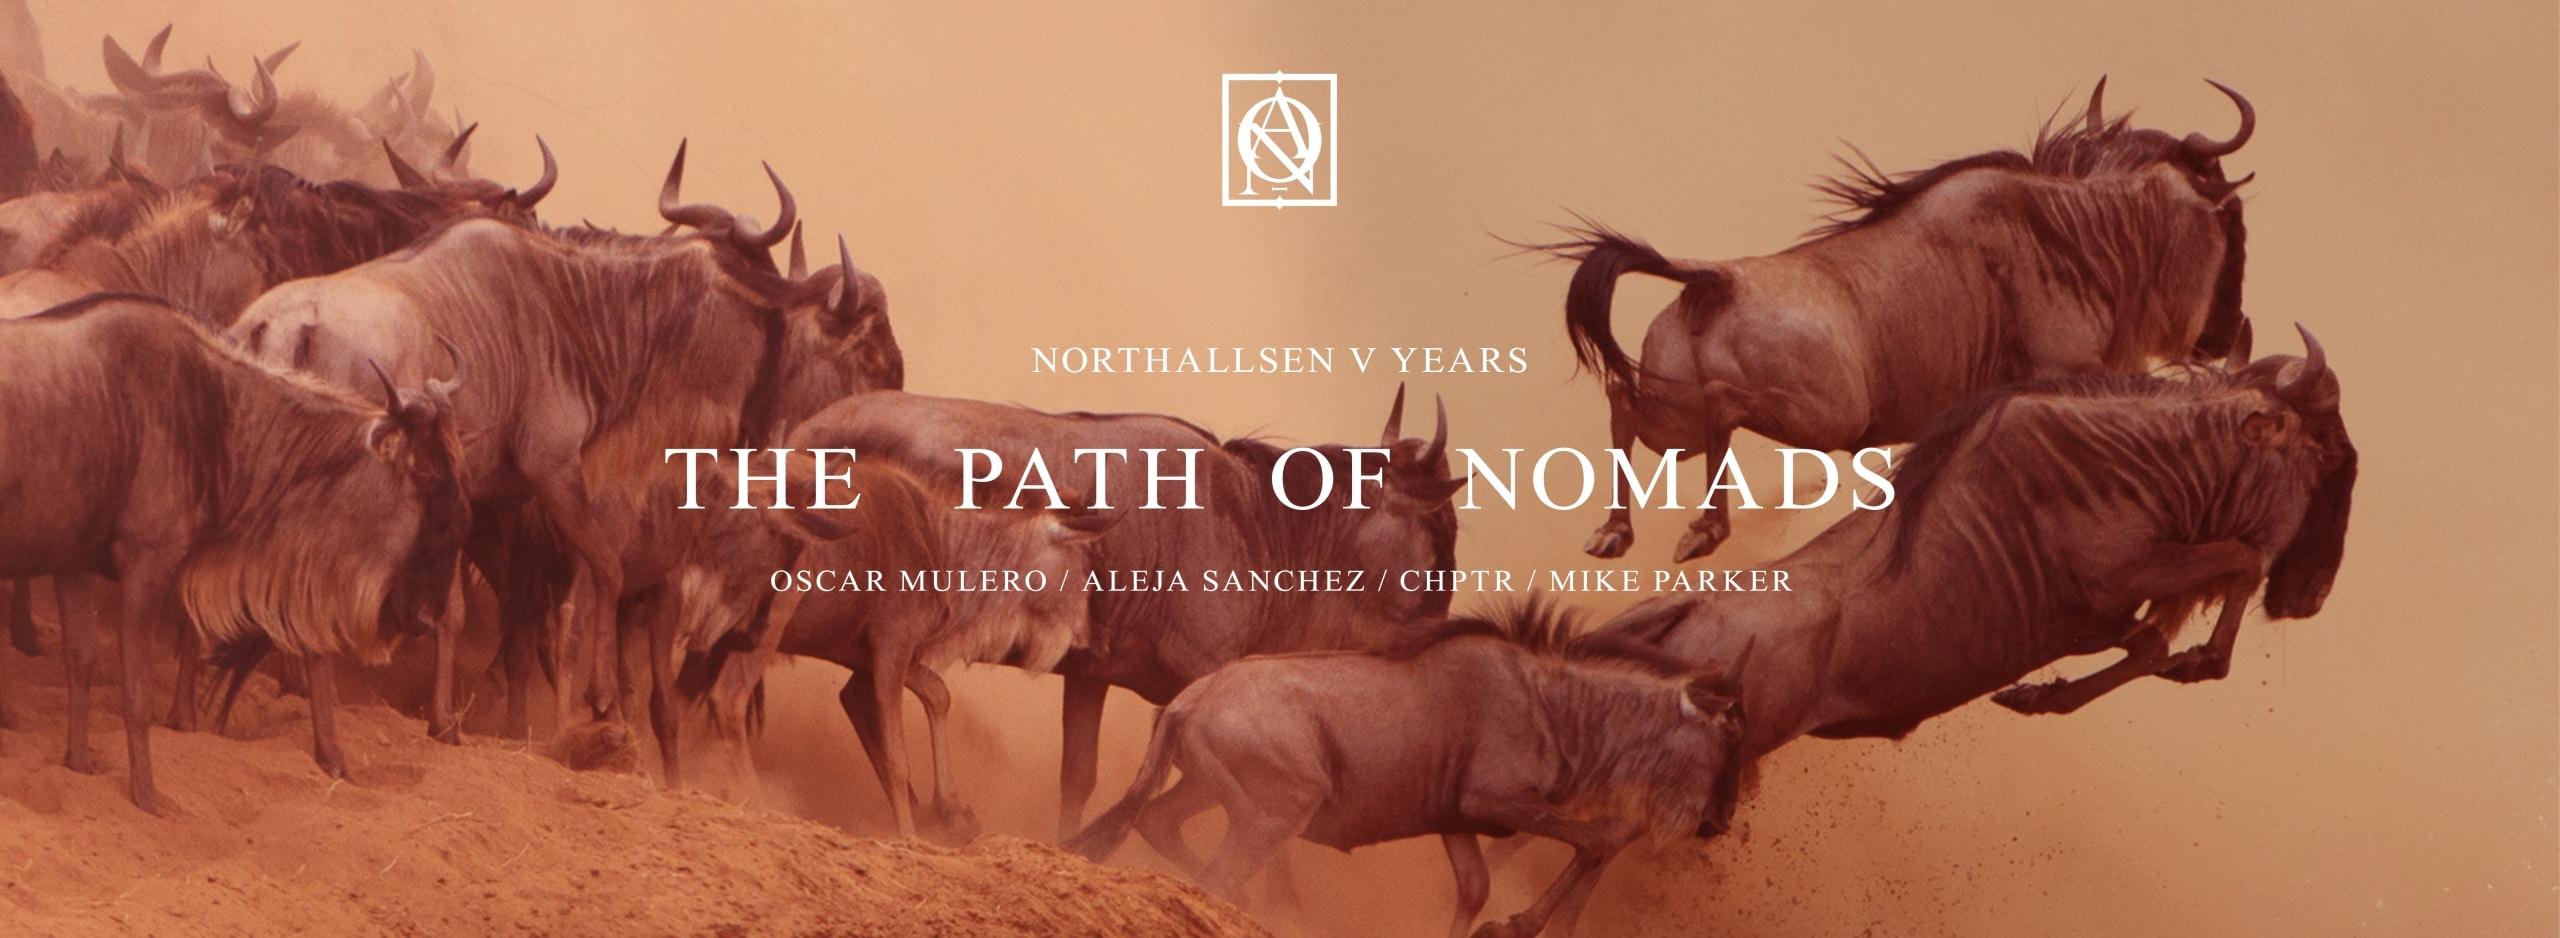 "Oscar Mulero - ""Self-Determination"" - Northallsen Records"